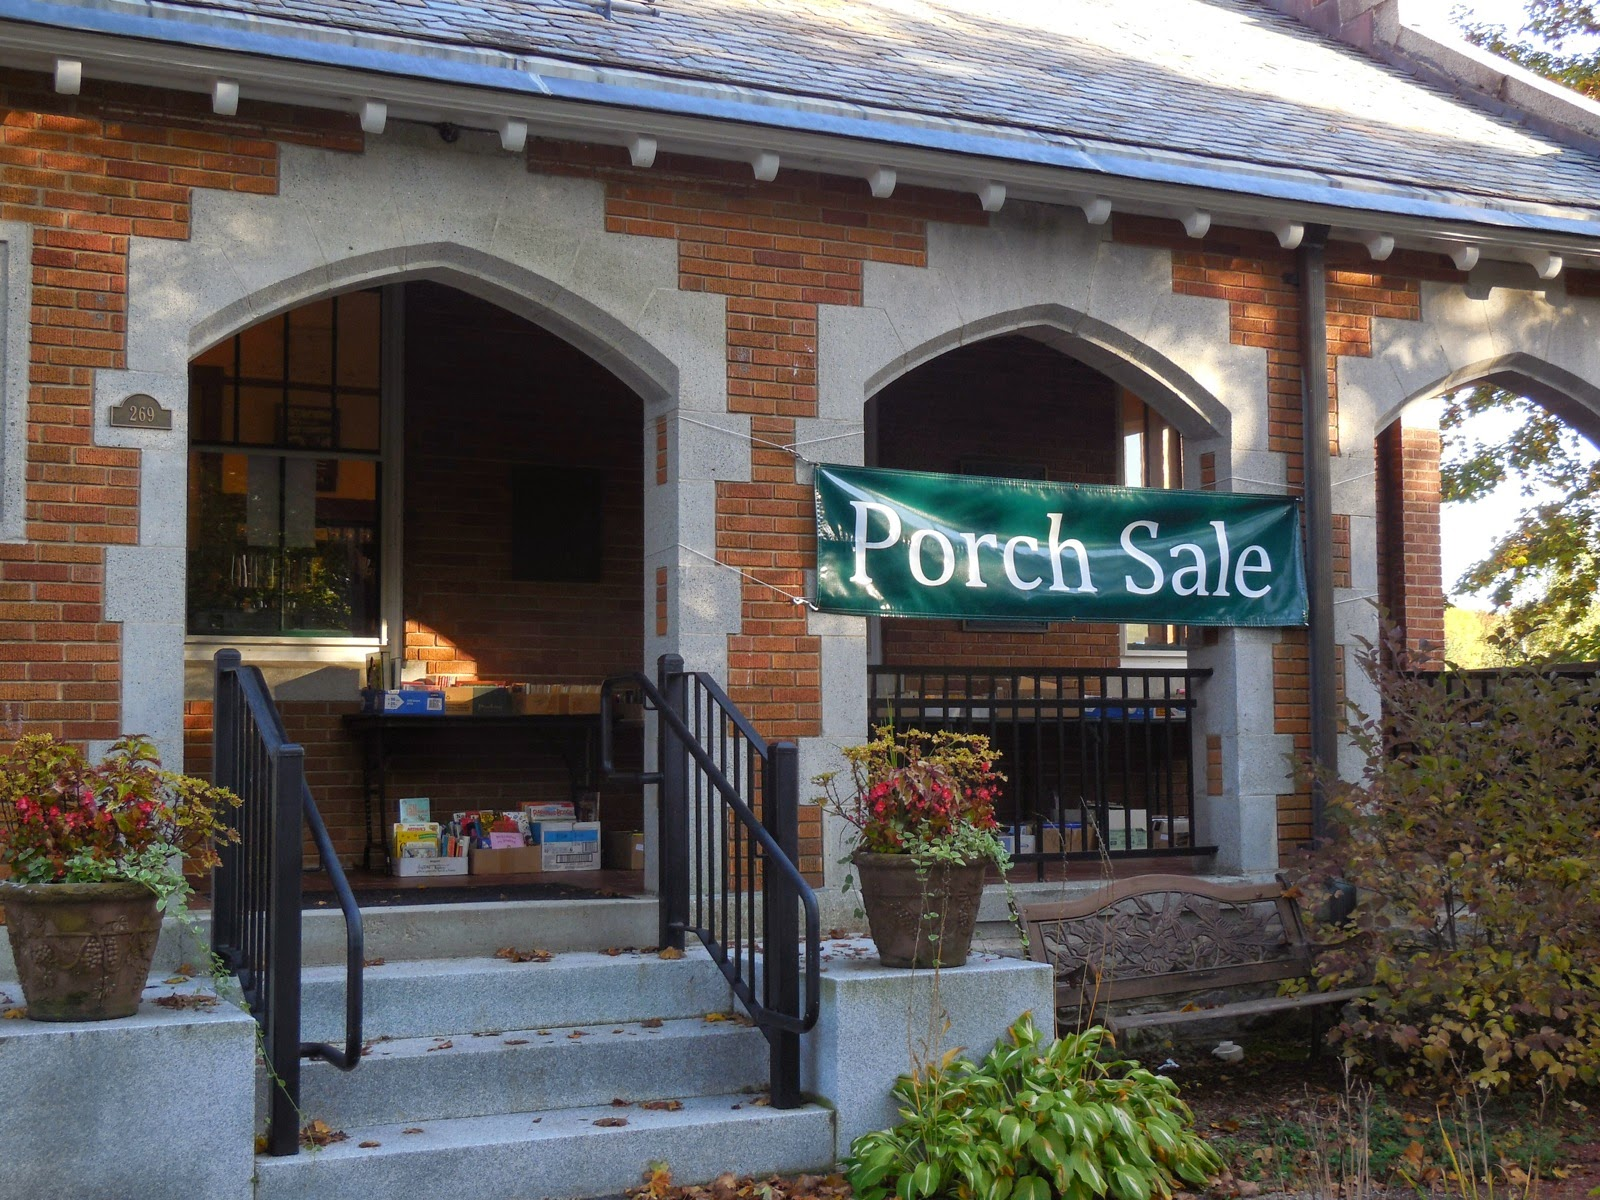 Annual 24/7 Porch Book Sale October 3-18, 2015